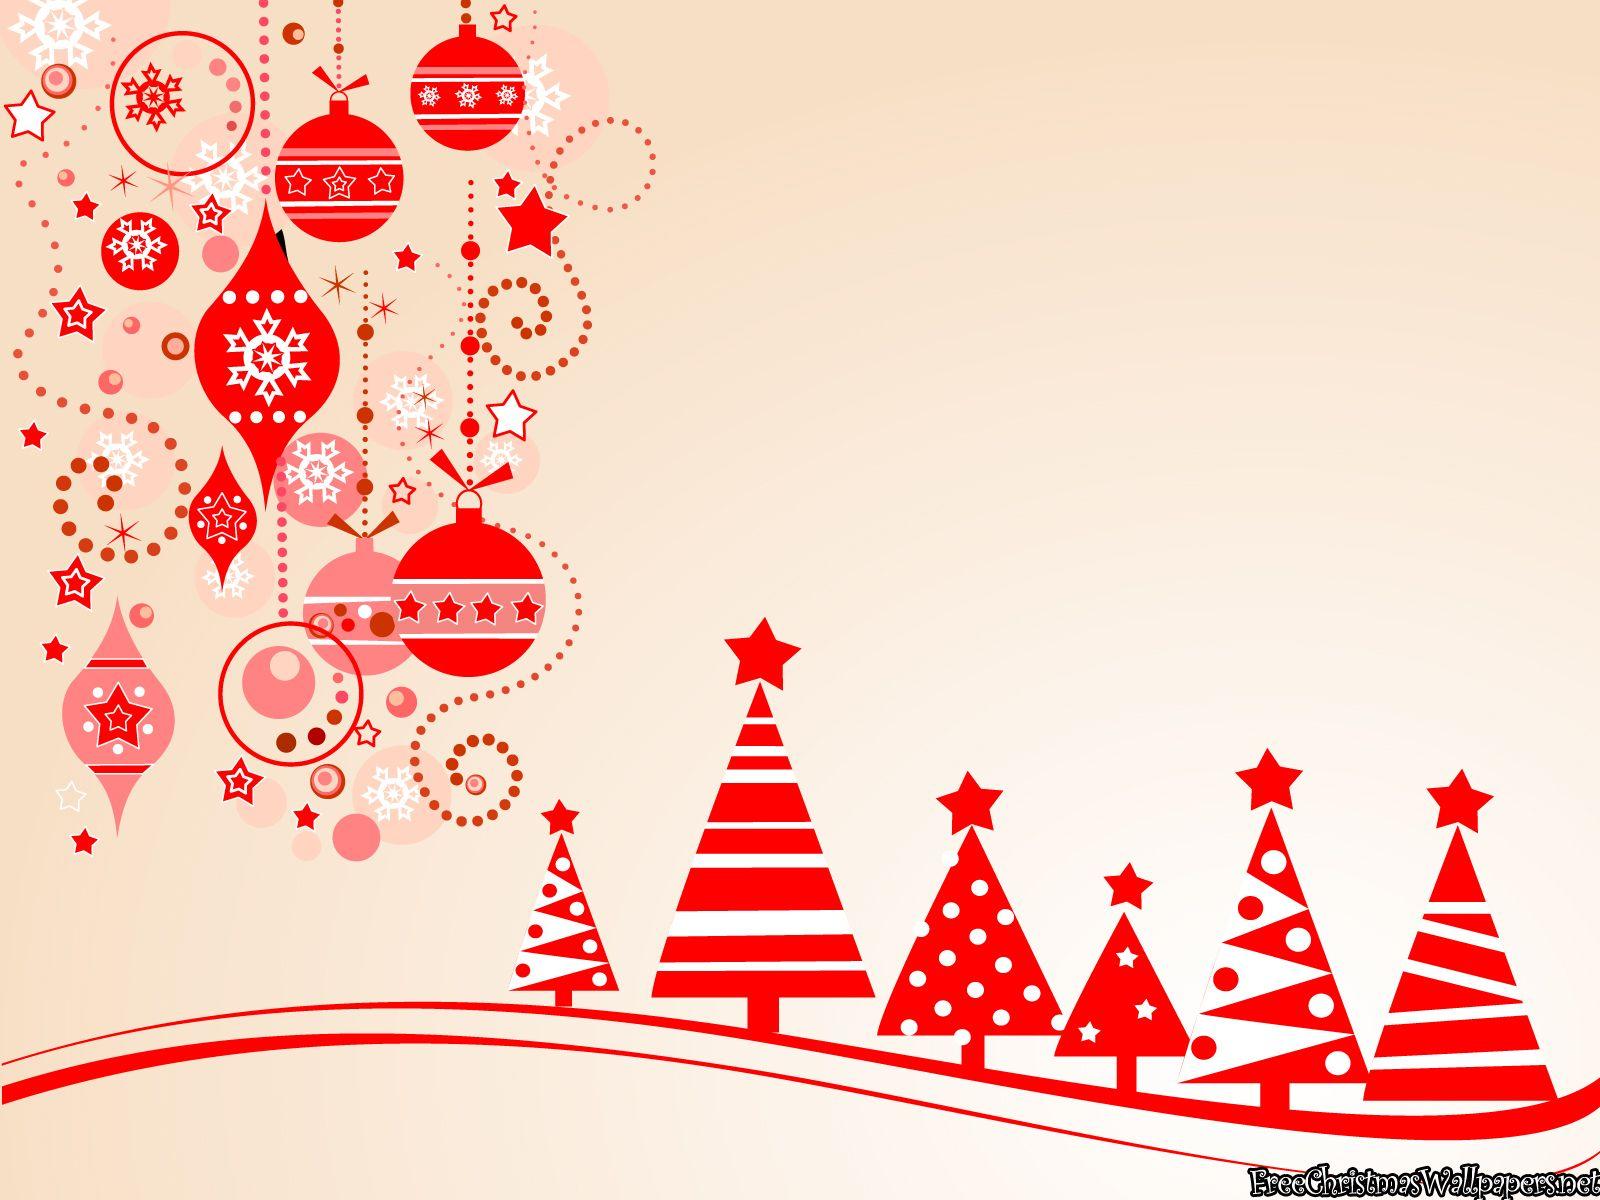 Christmas Clipart Free Christmas Desktop Wallpaper Christmas Clipart Free Christmas Desktop Wallpaper